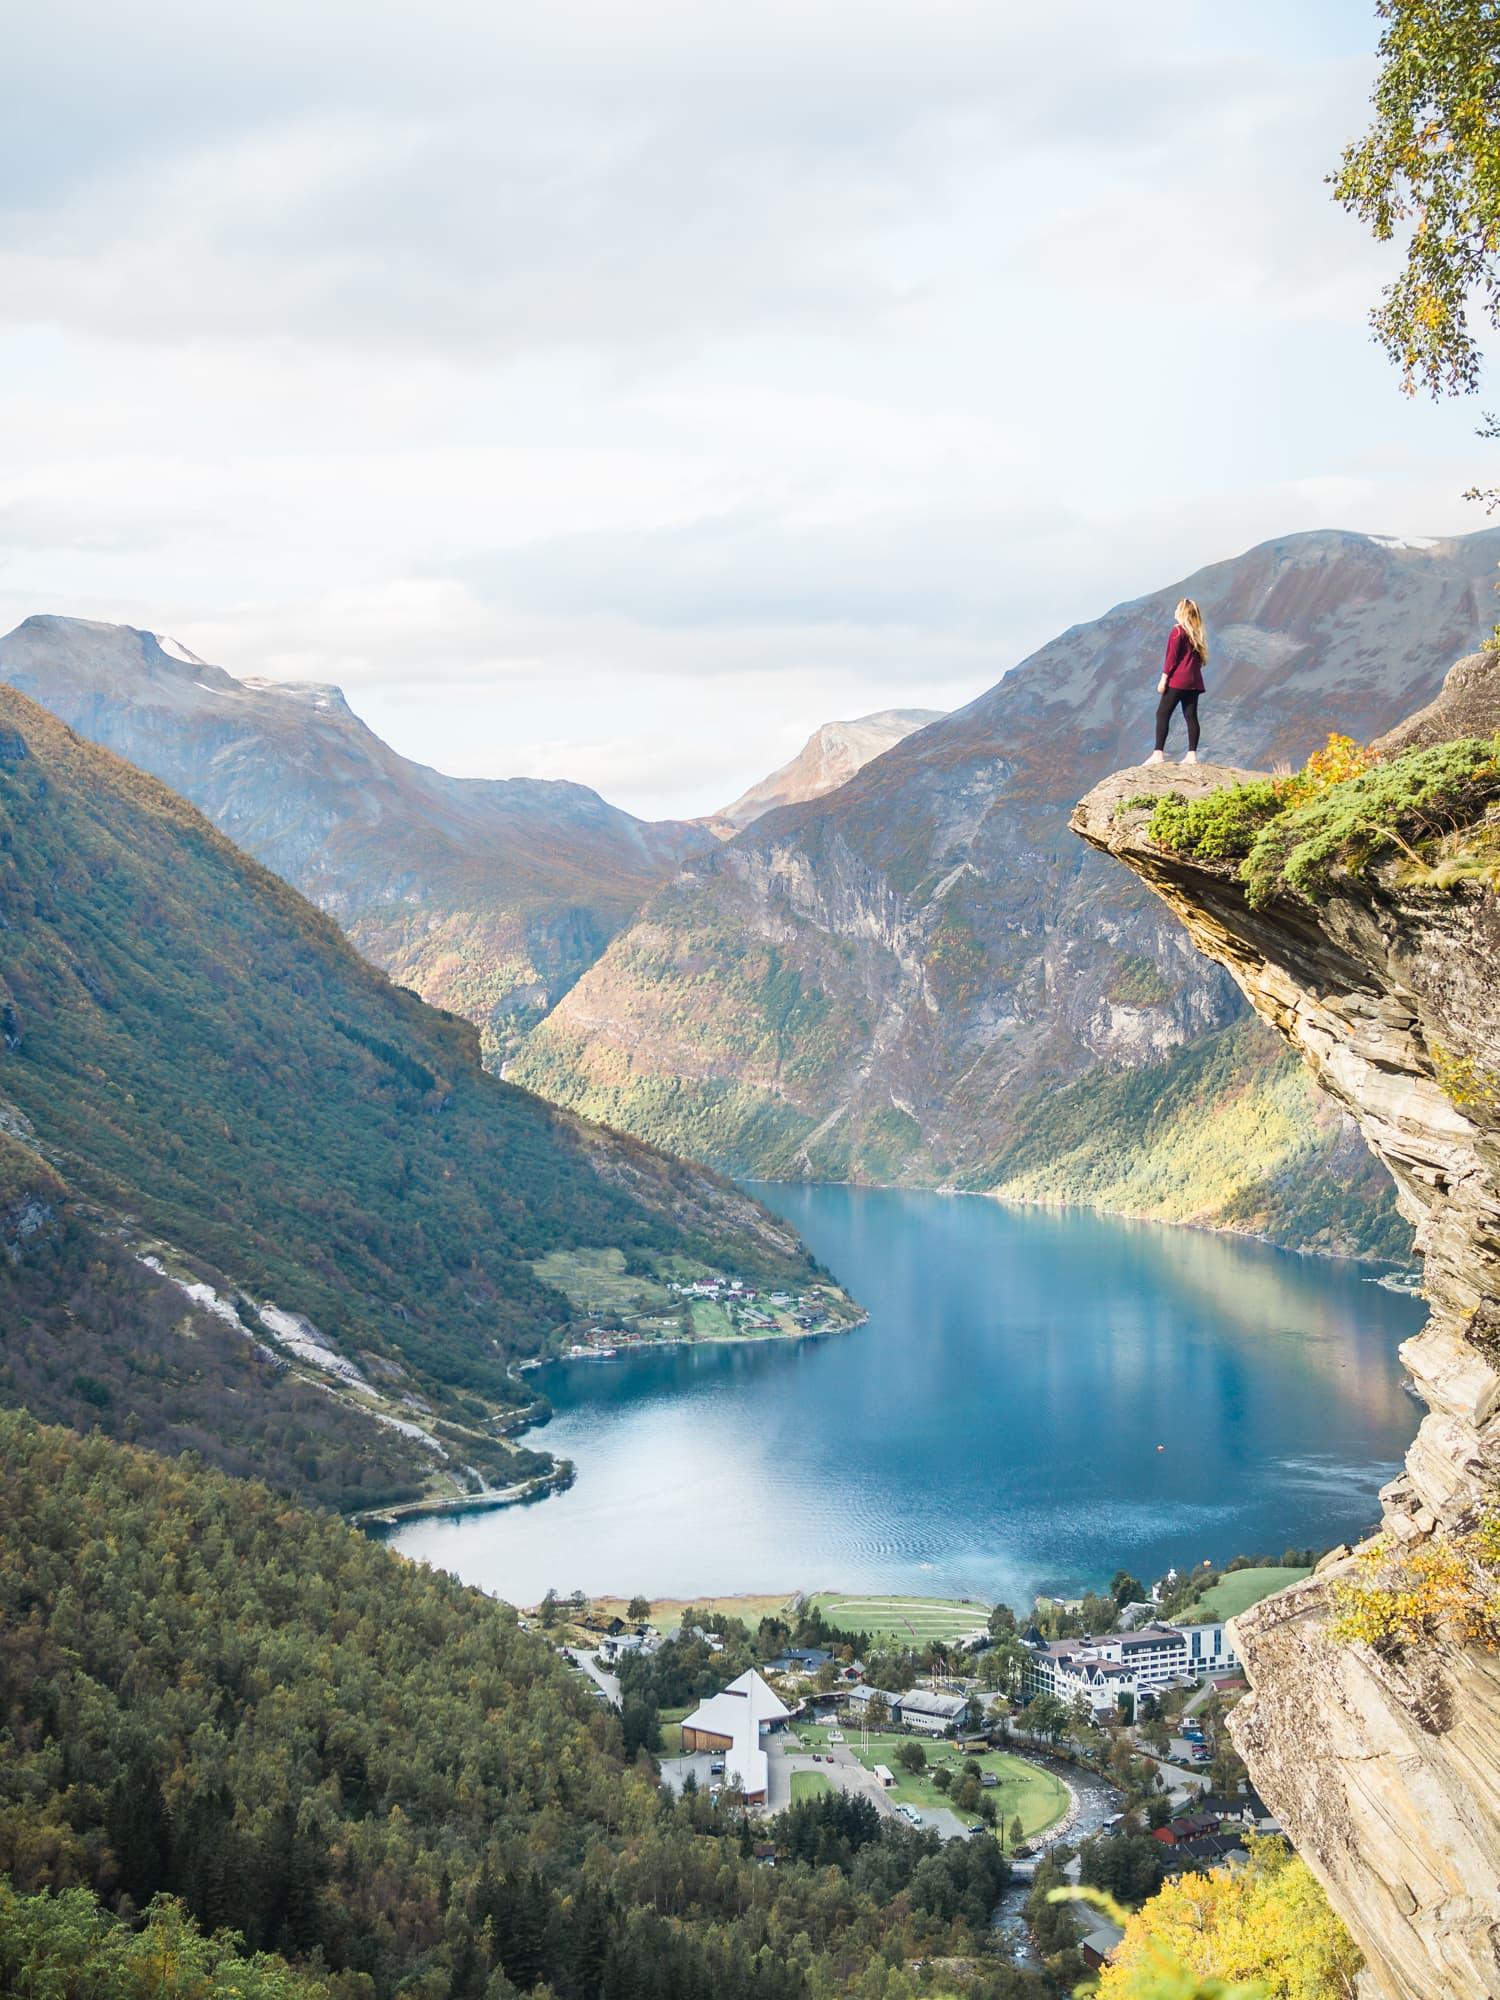 Geirangerfjorden in Norway - Favorite Instagram, photos 2017